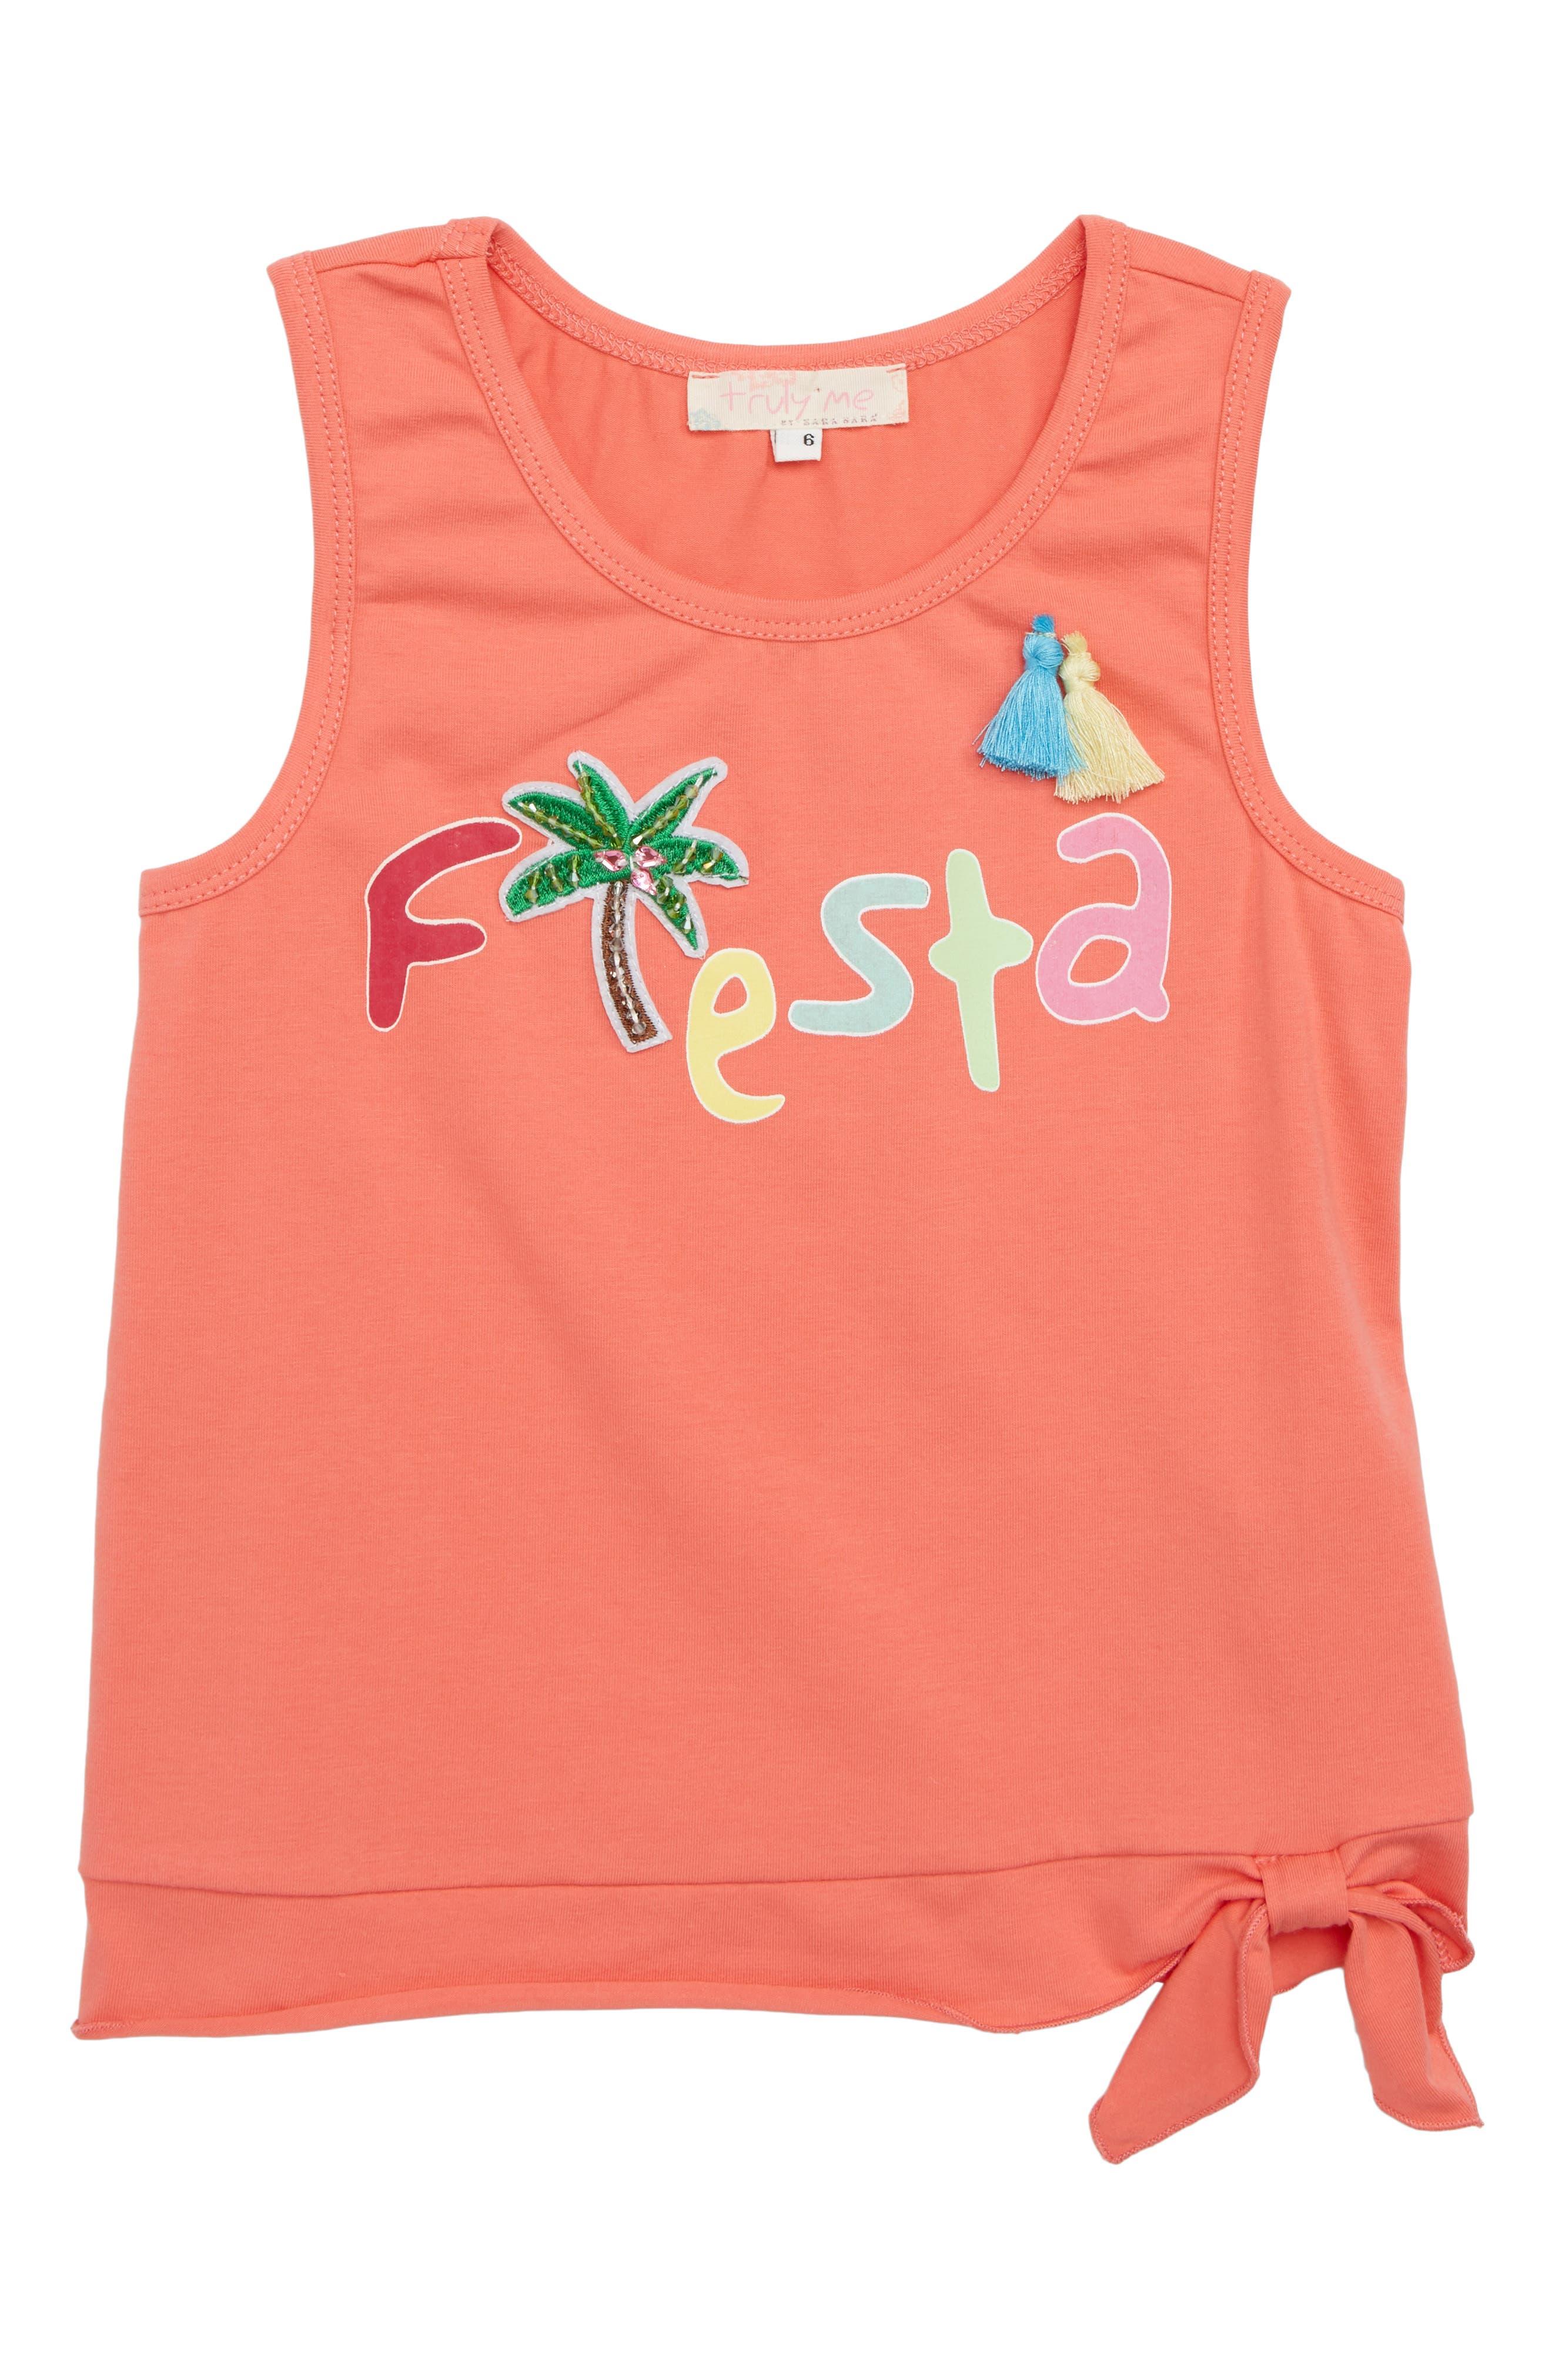 Fiesta Side Tie Tank,                             Main thumbnail 1, color,                             Orange